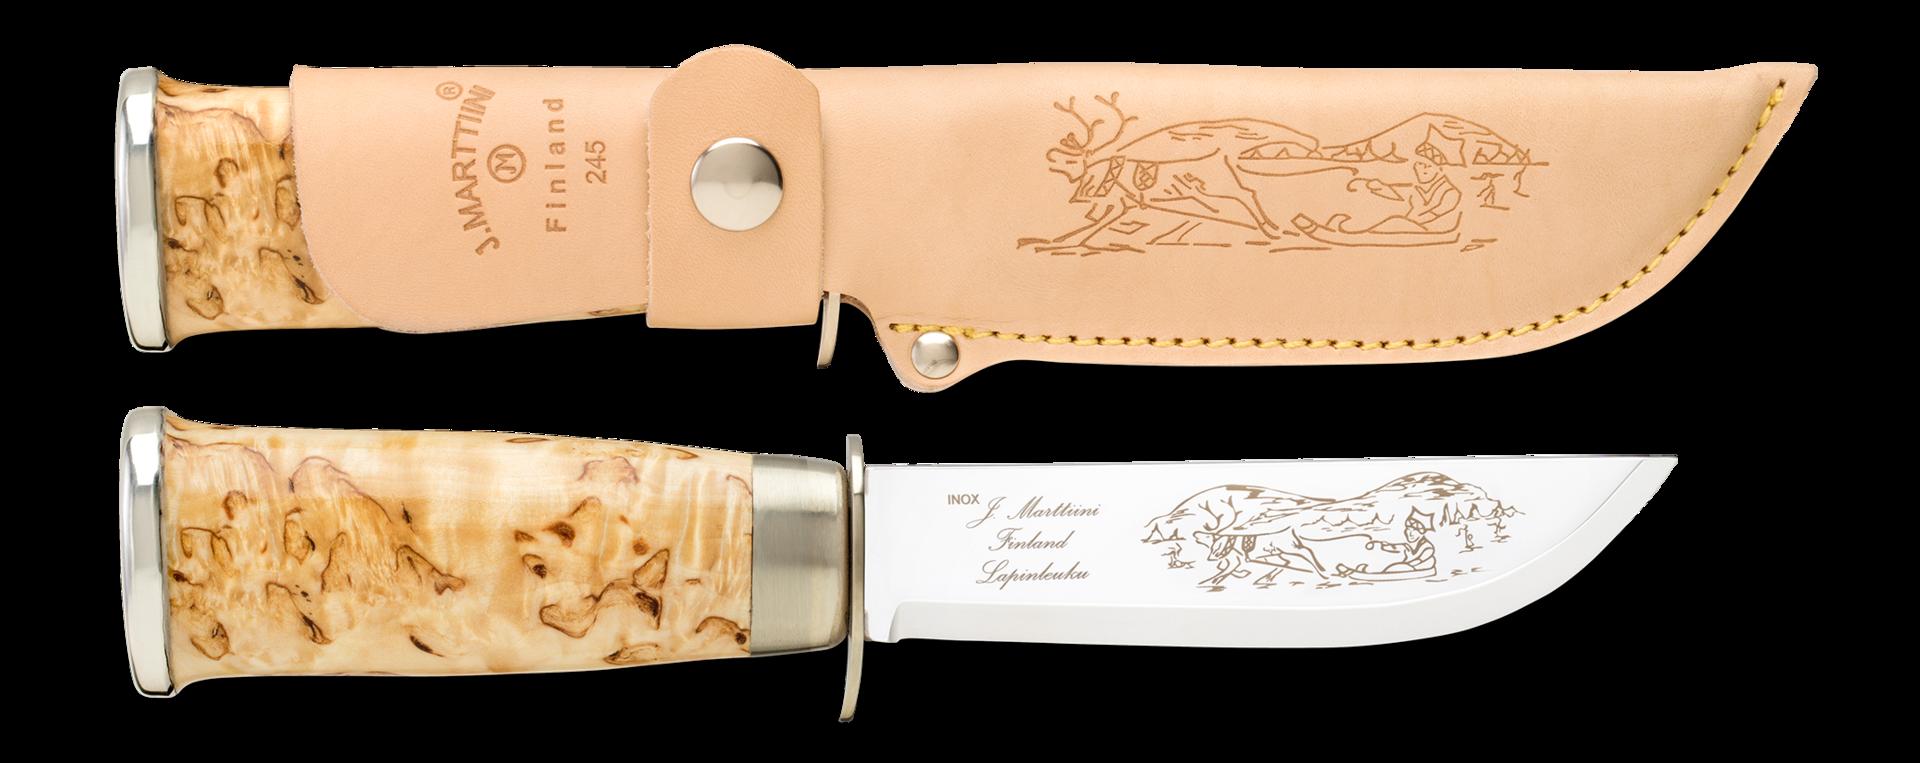 Lapp knife 245